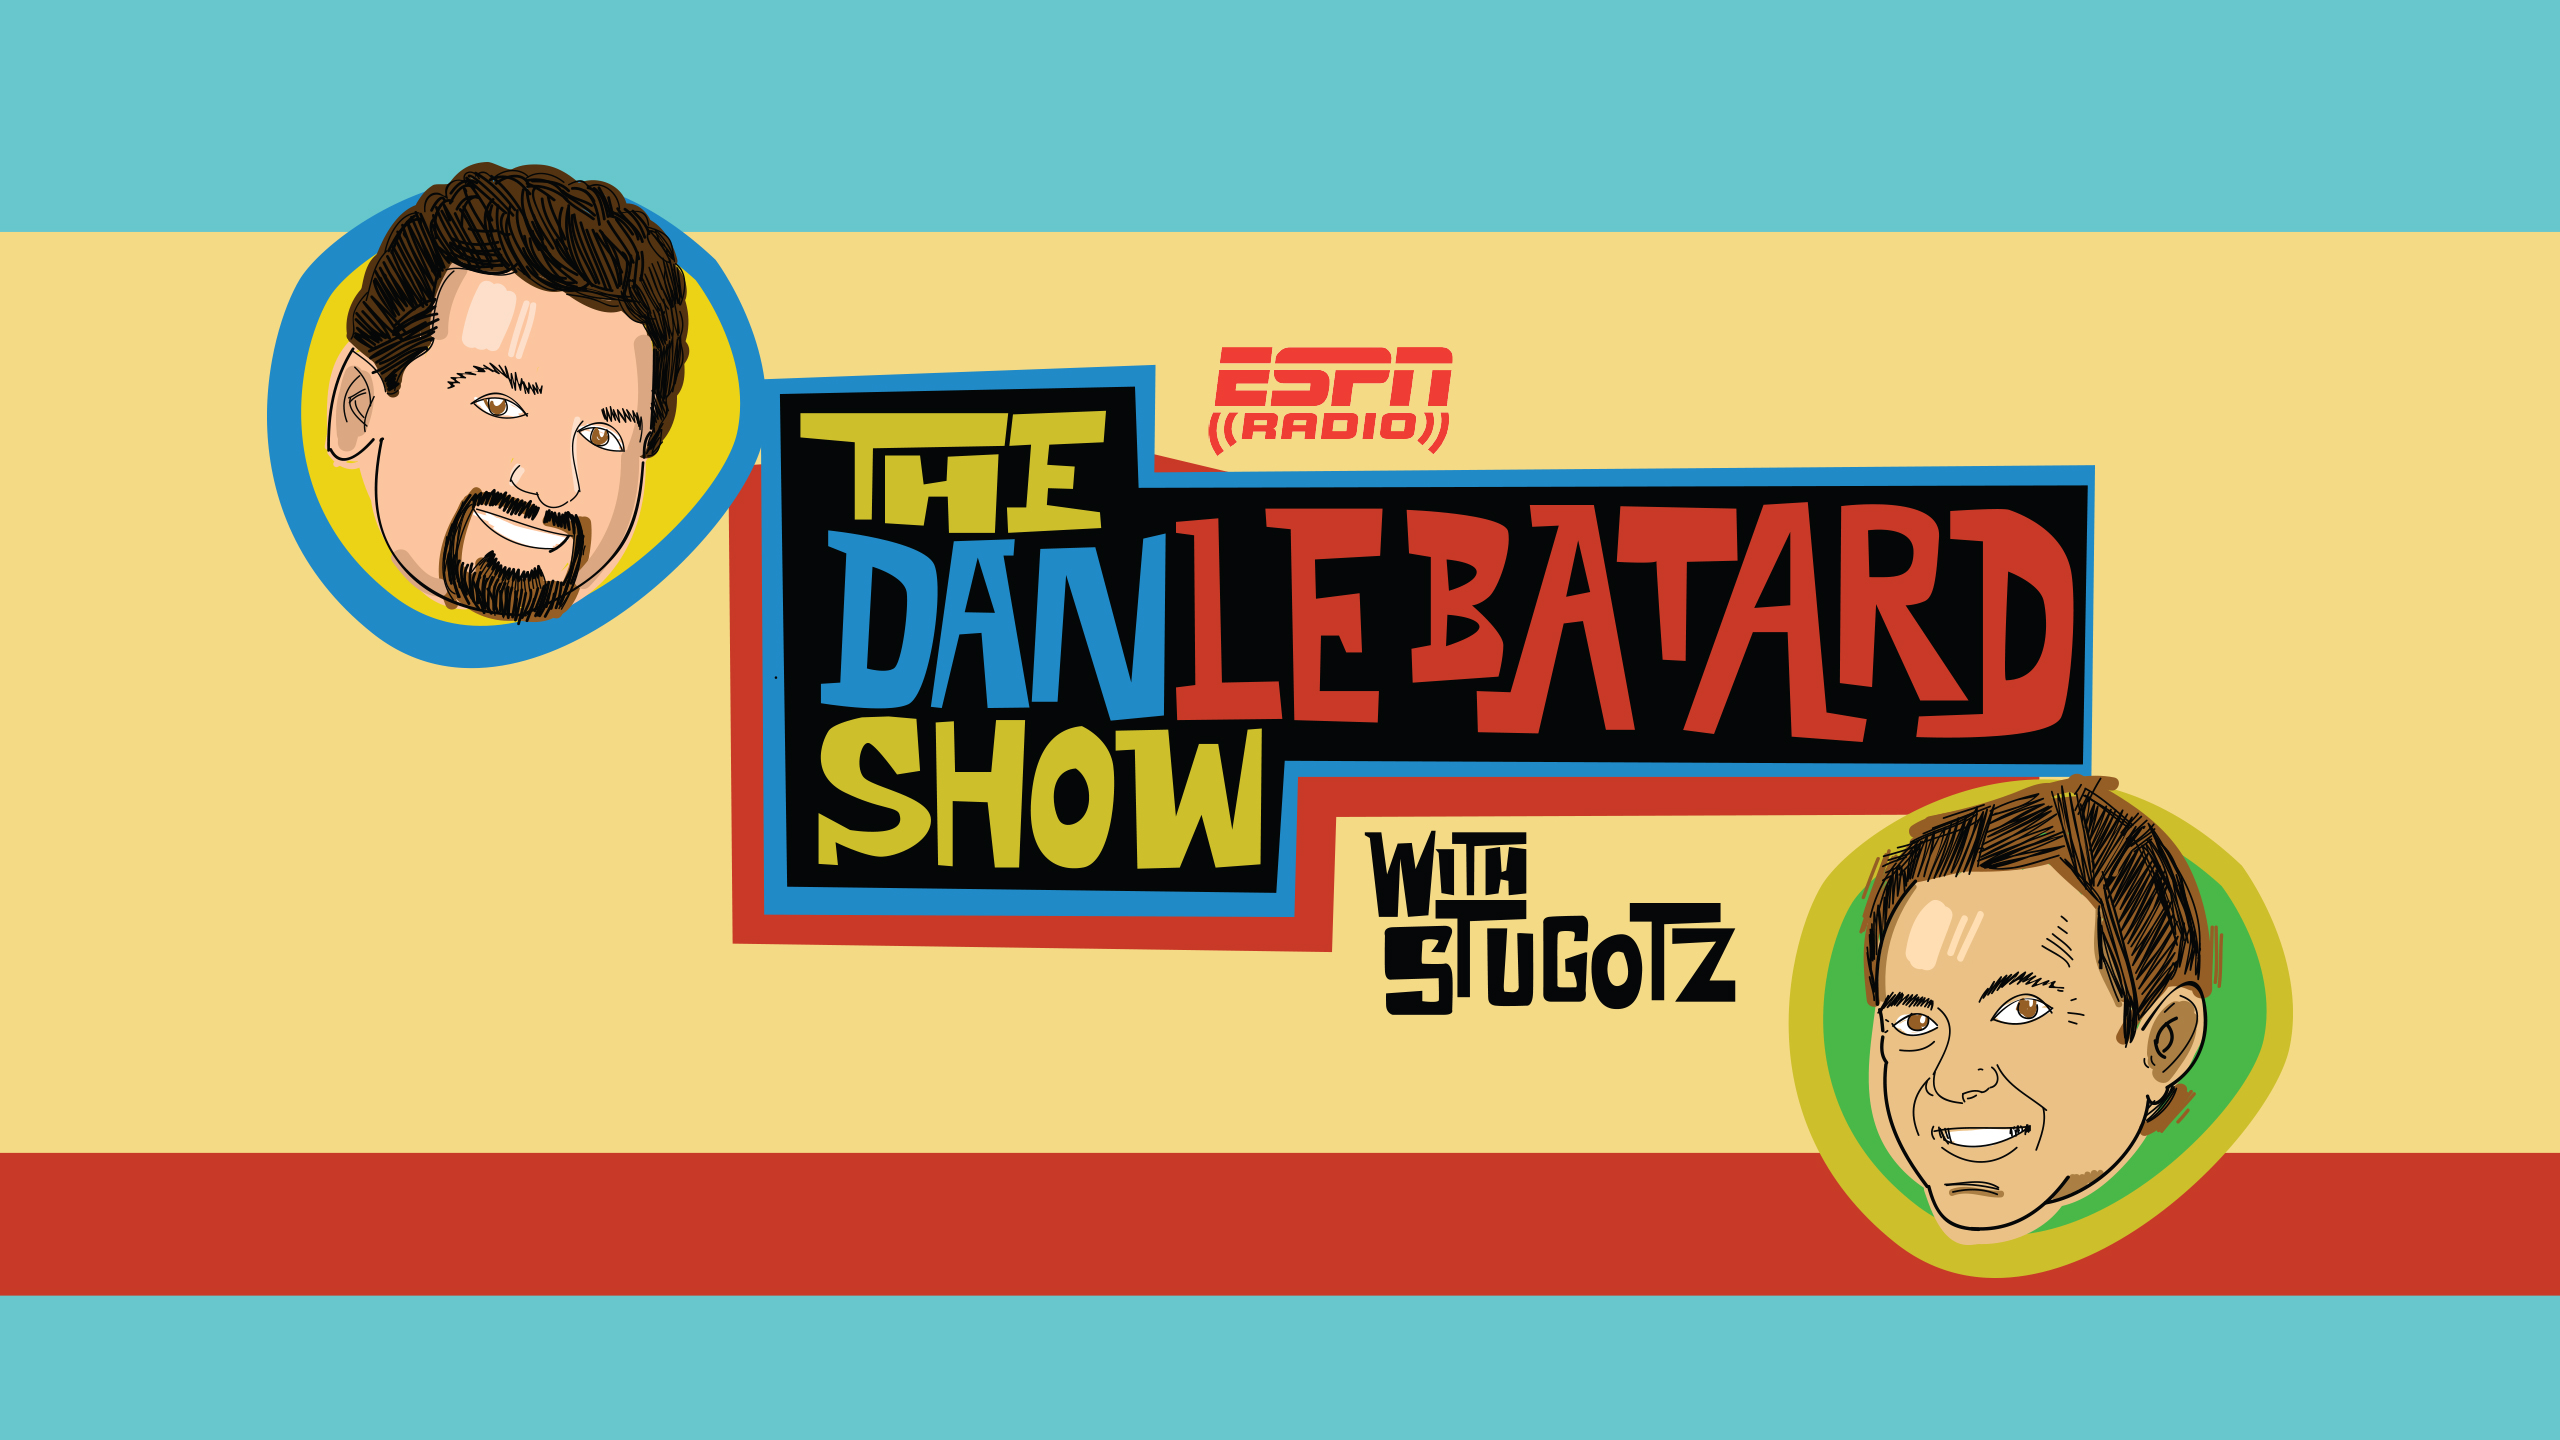 Mon, 9/17 - The Dan Le Batard Show with Stugotz Presented by Progressive